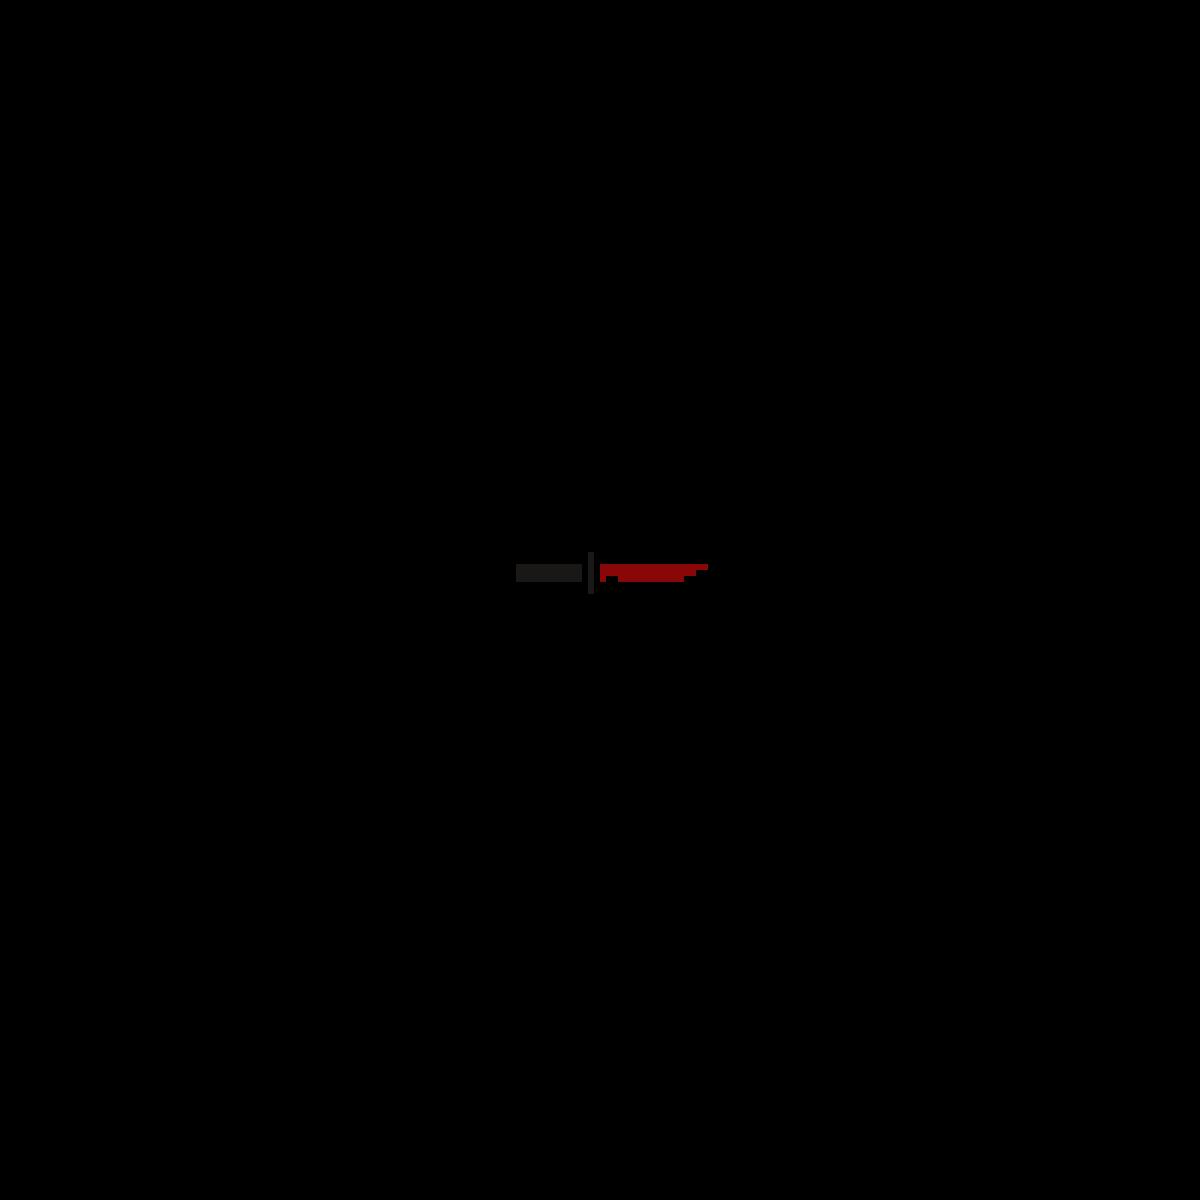 pixilart m9 bayonet crimson web by sleych